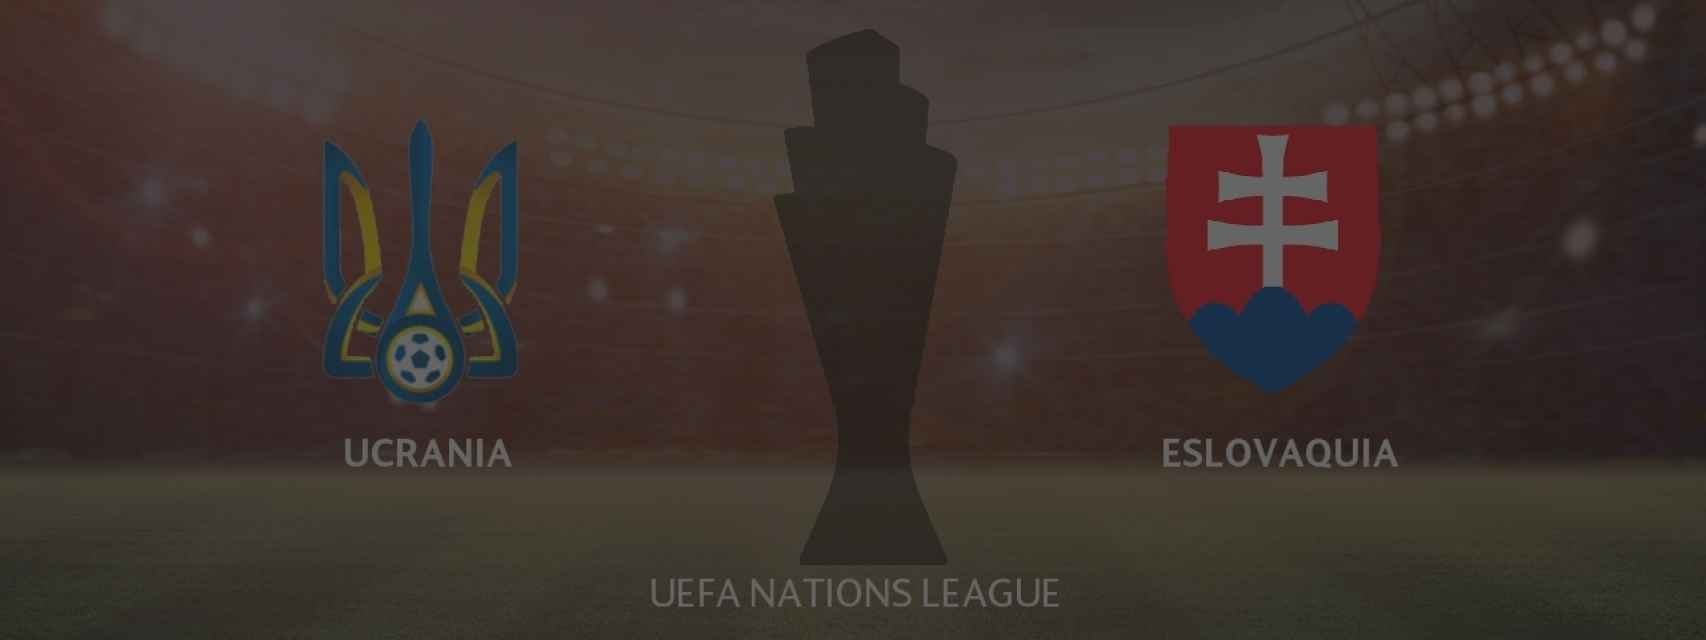 Ucrania - Eslovaquia, UEFA Nations League